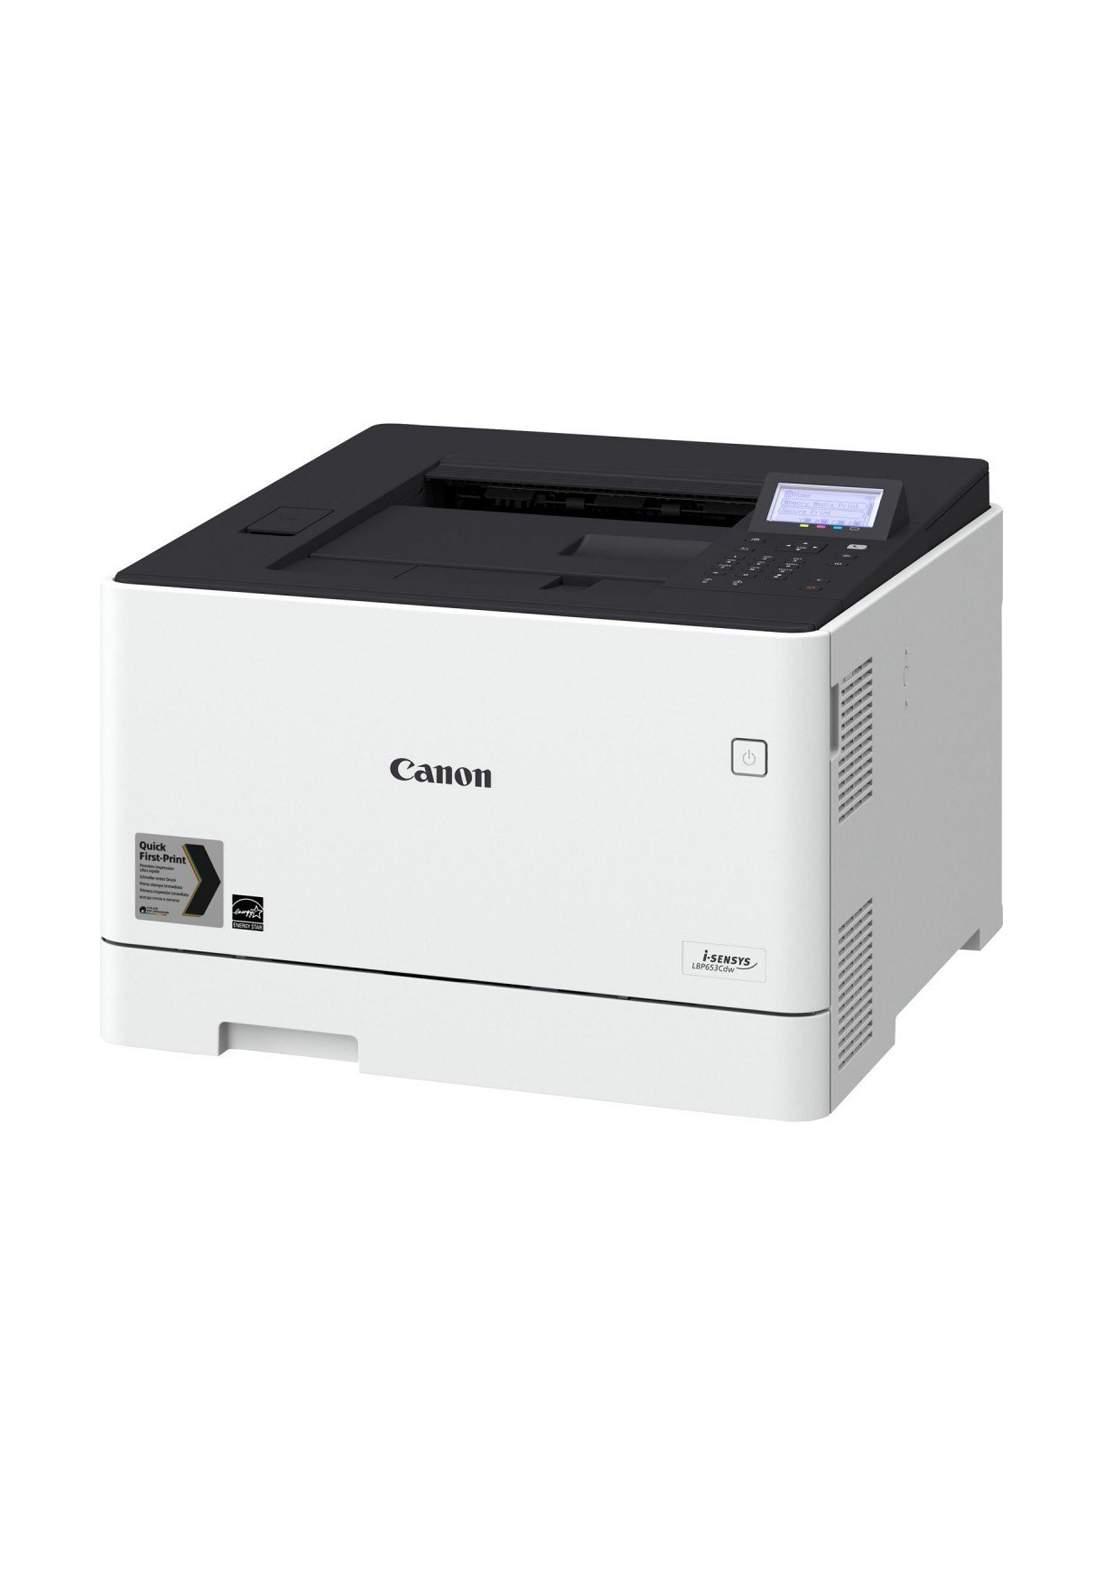 Canon i-SENSYS LBP653Cdw color laser printer - White  طابعة